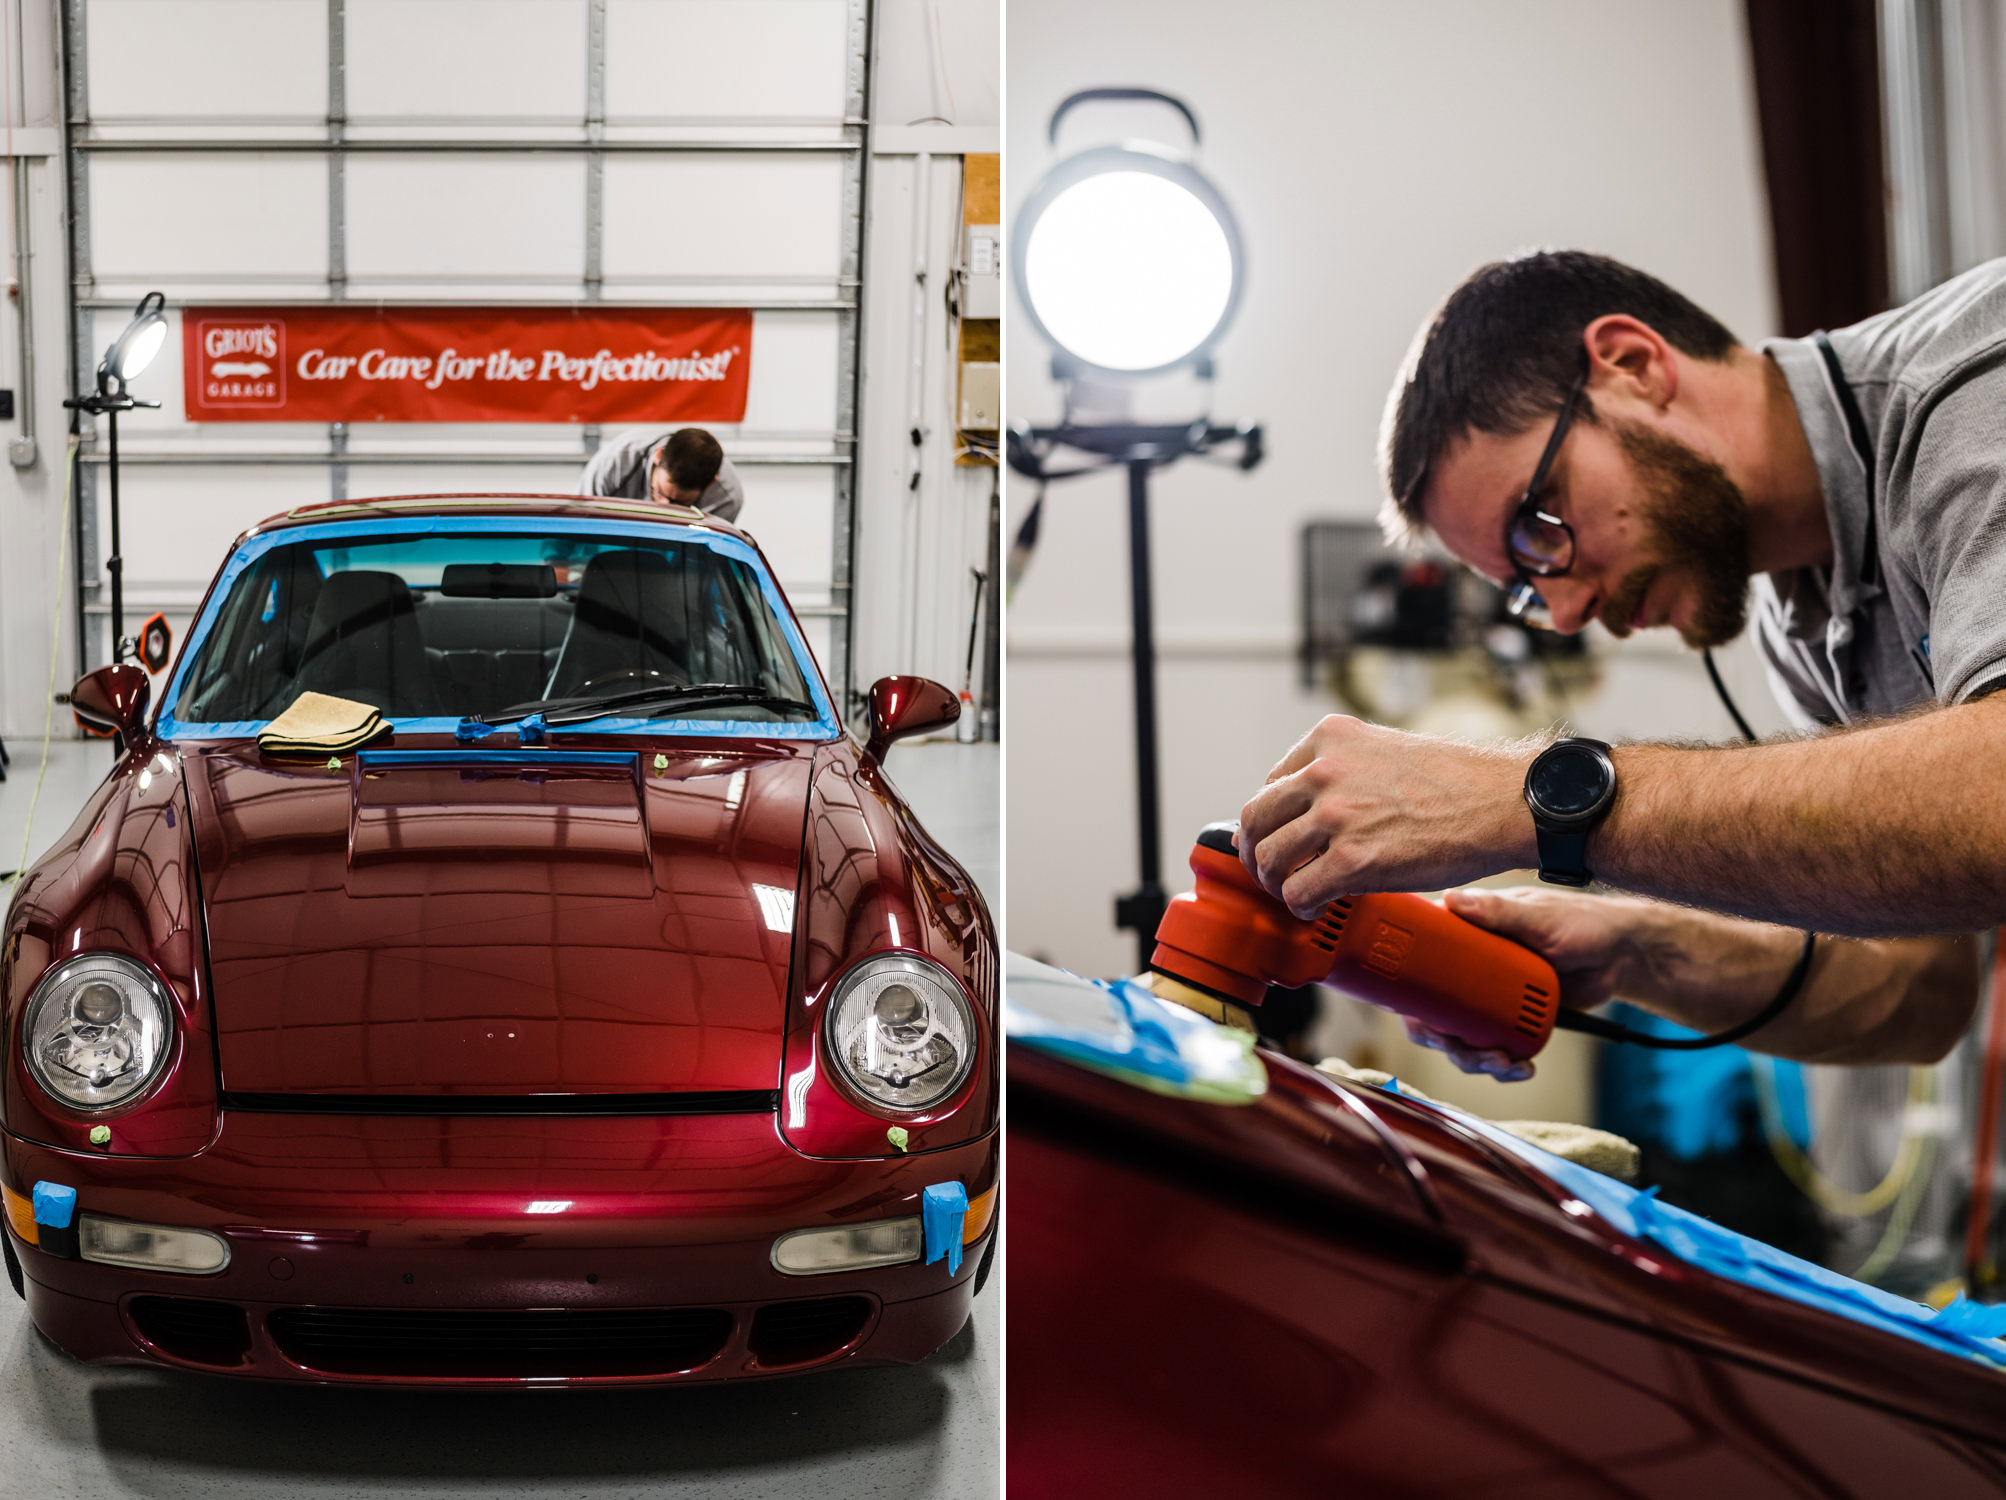 Porsche 911 Carrera 4S-Porsche 993-Porsche 911-Paint Correction-Car Wash-Car Detailing-102.jpg